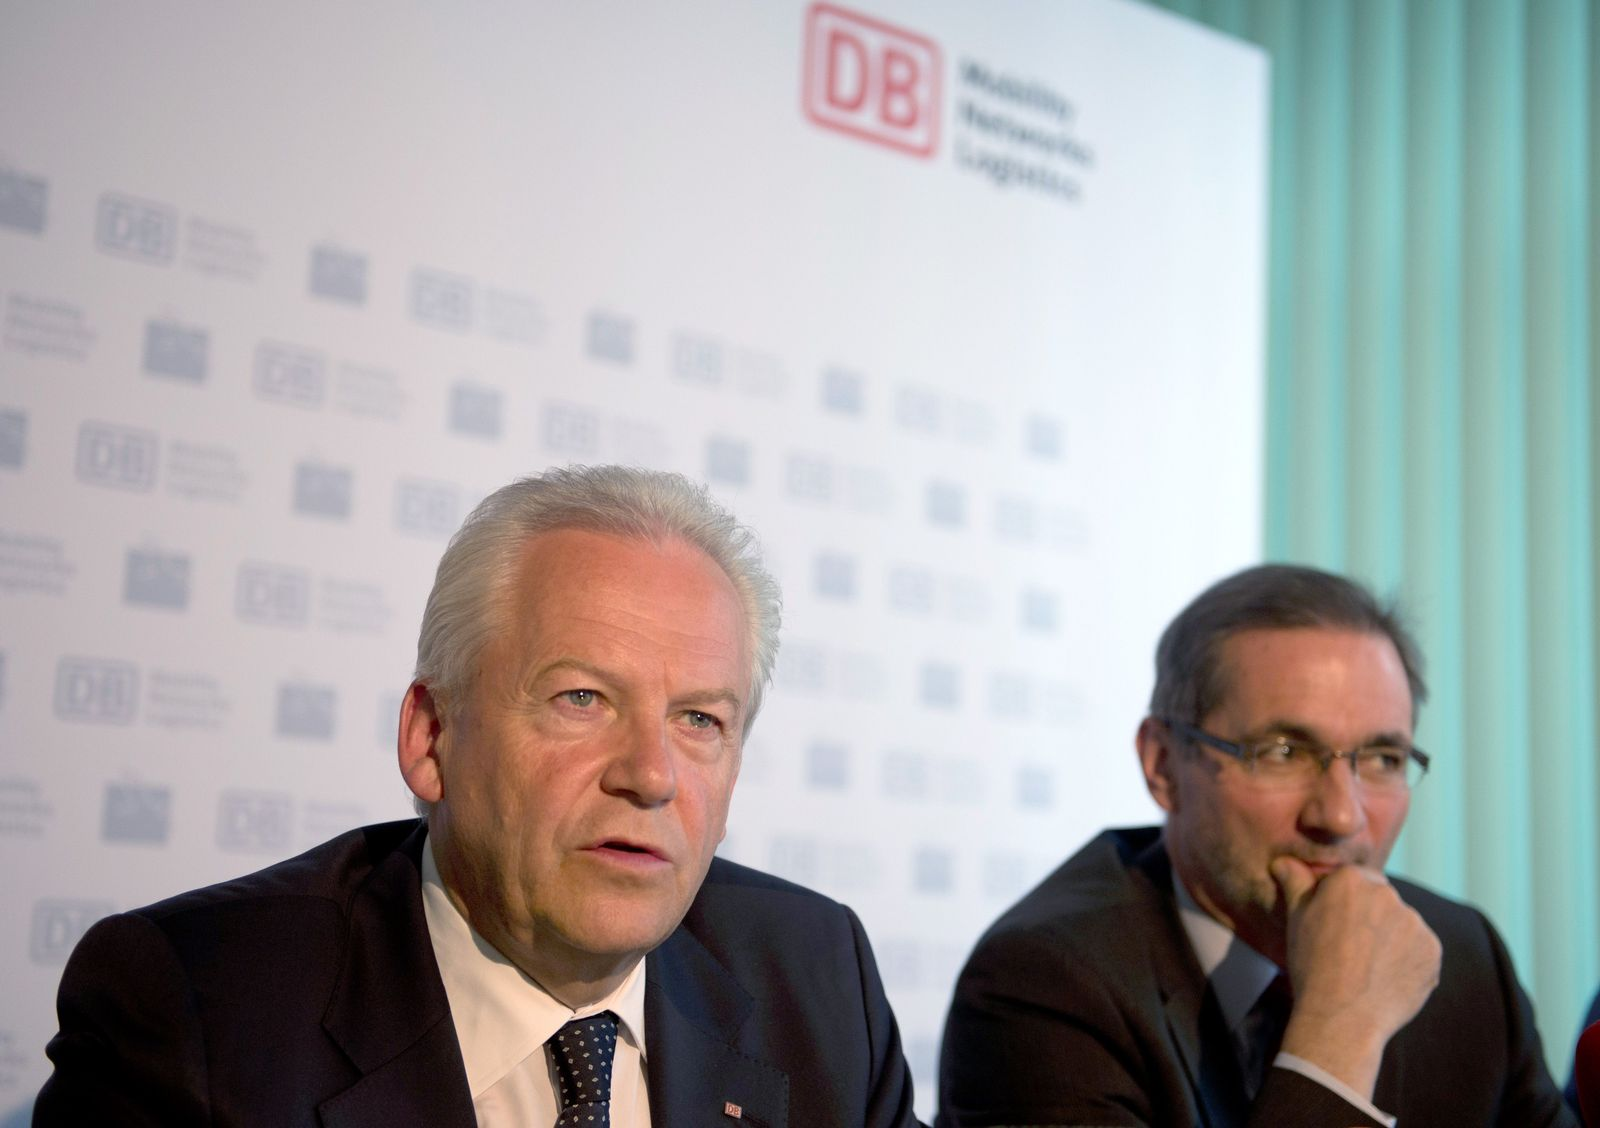 Rüdiger Grube/ Matthias Platzeck